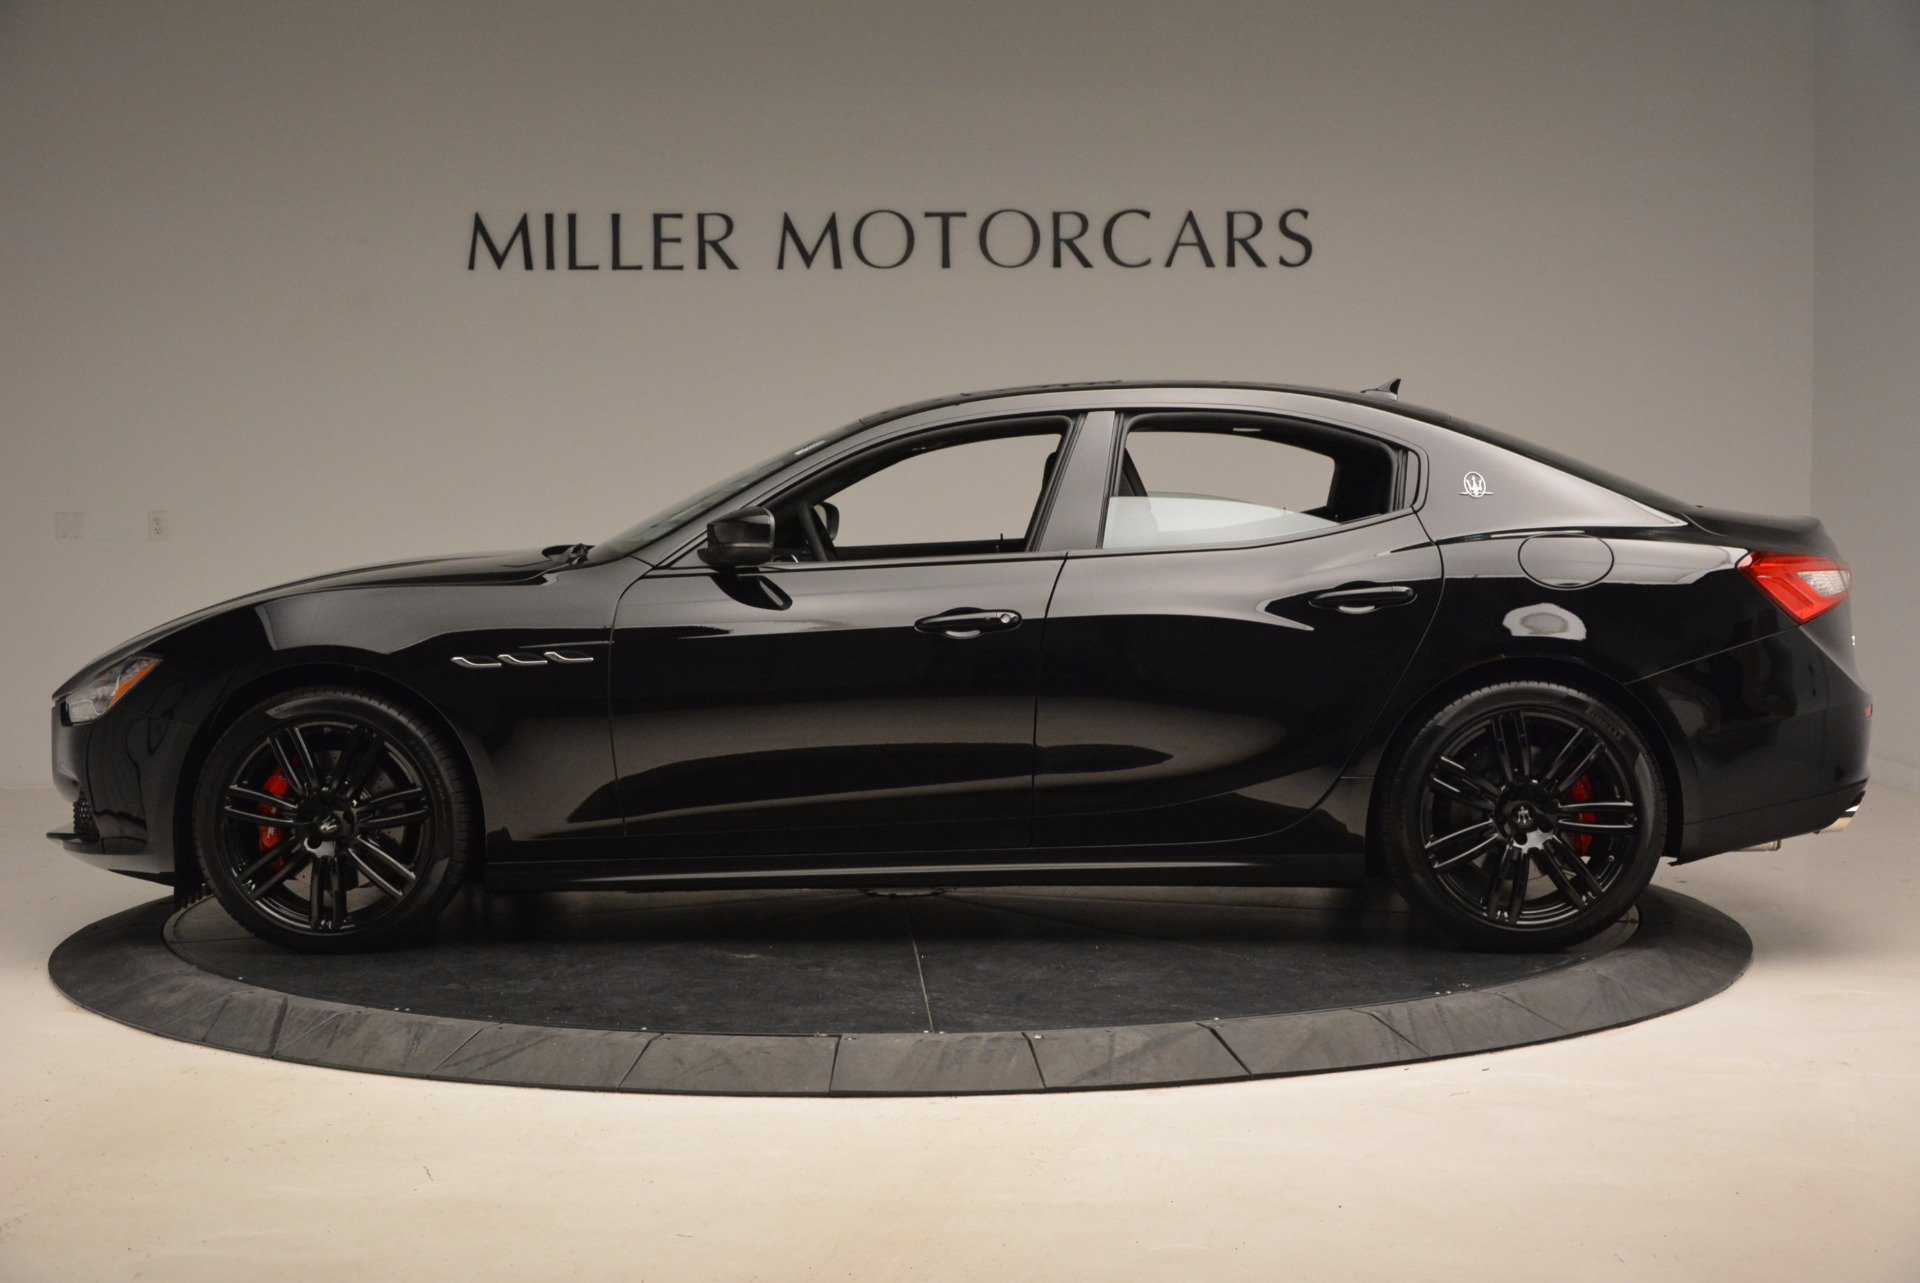 New 2017 Maserati Ghibli SQ4 S Q4 Nerissimo Edition For Sale In Westport, CT 1334_p3